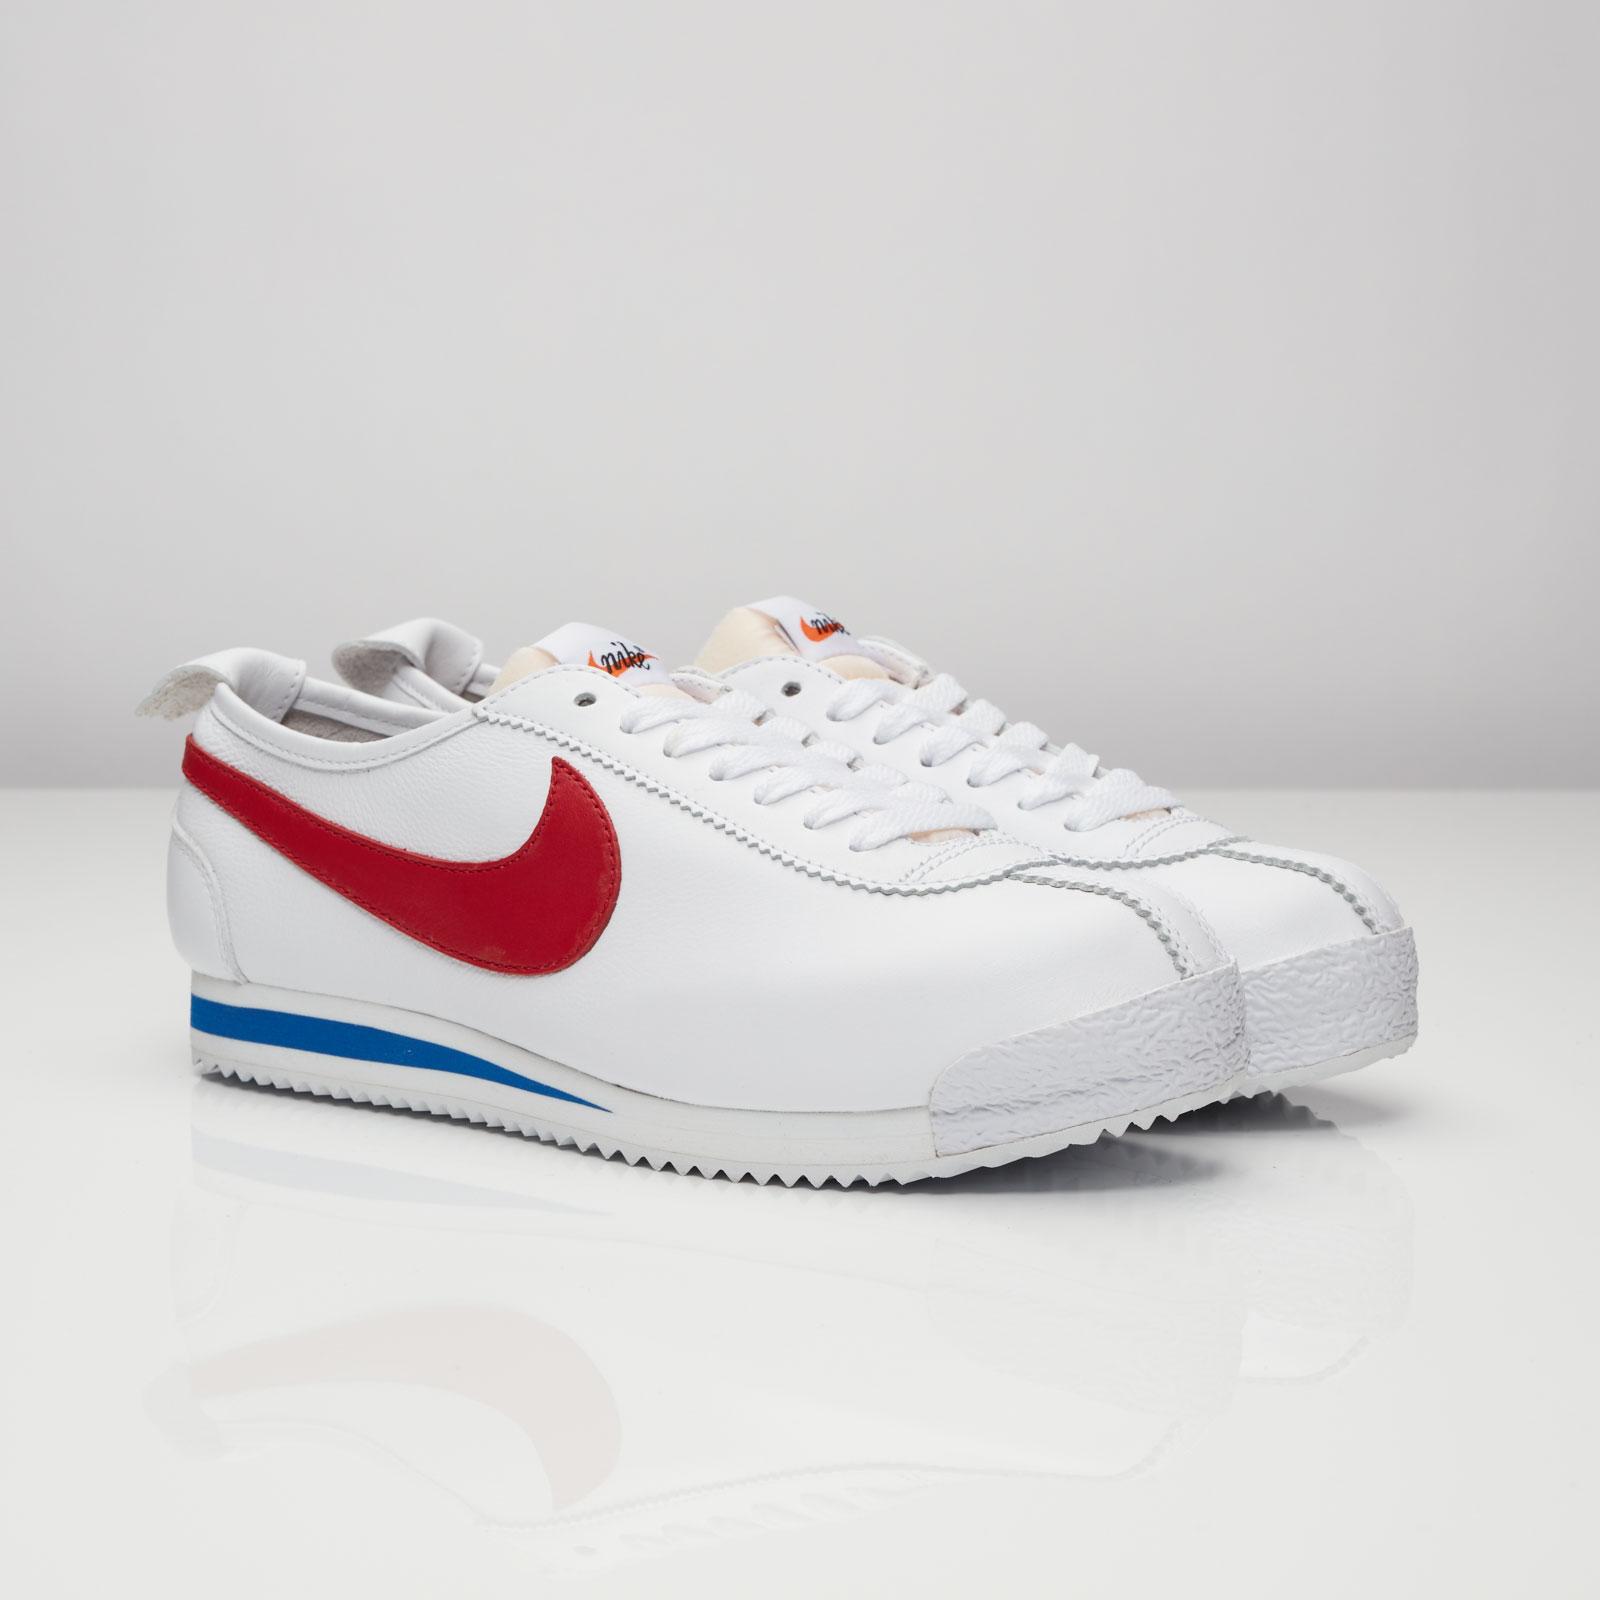 quality design 6d4df 9350f Nike Wmns Nike Cortez 72